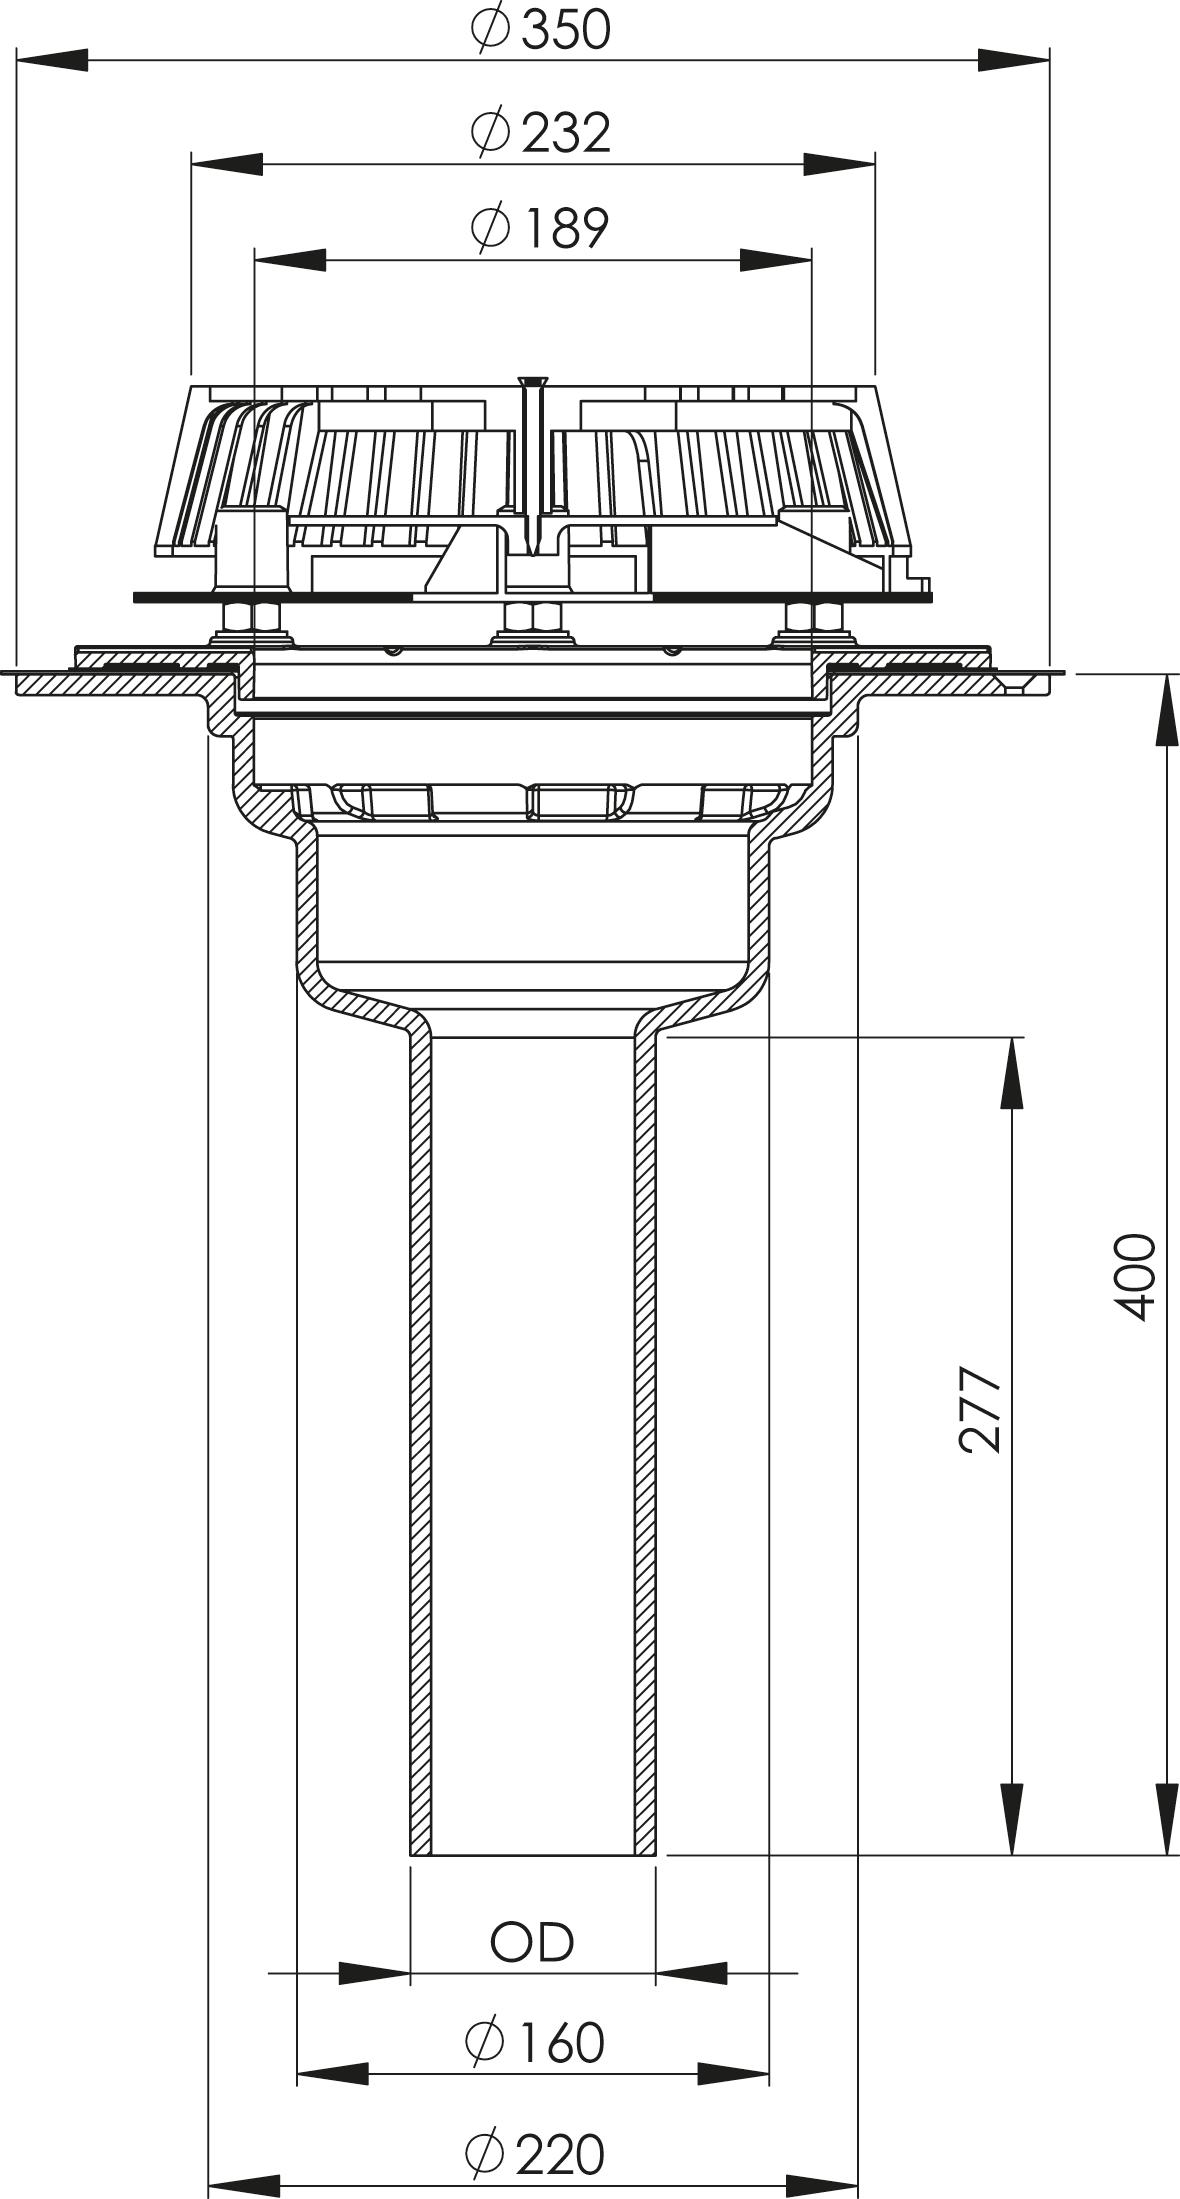 SitaDSS Multi  - Druckströmungsgully